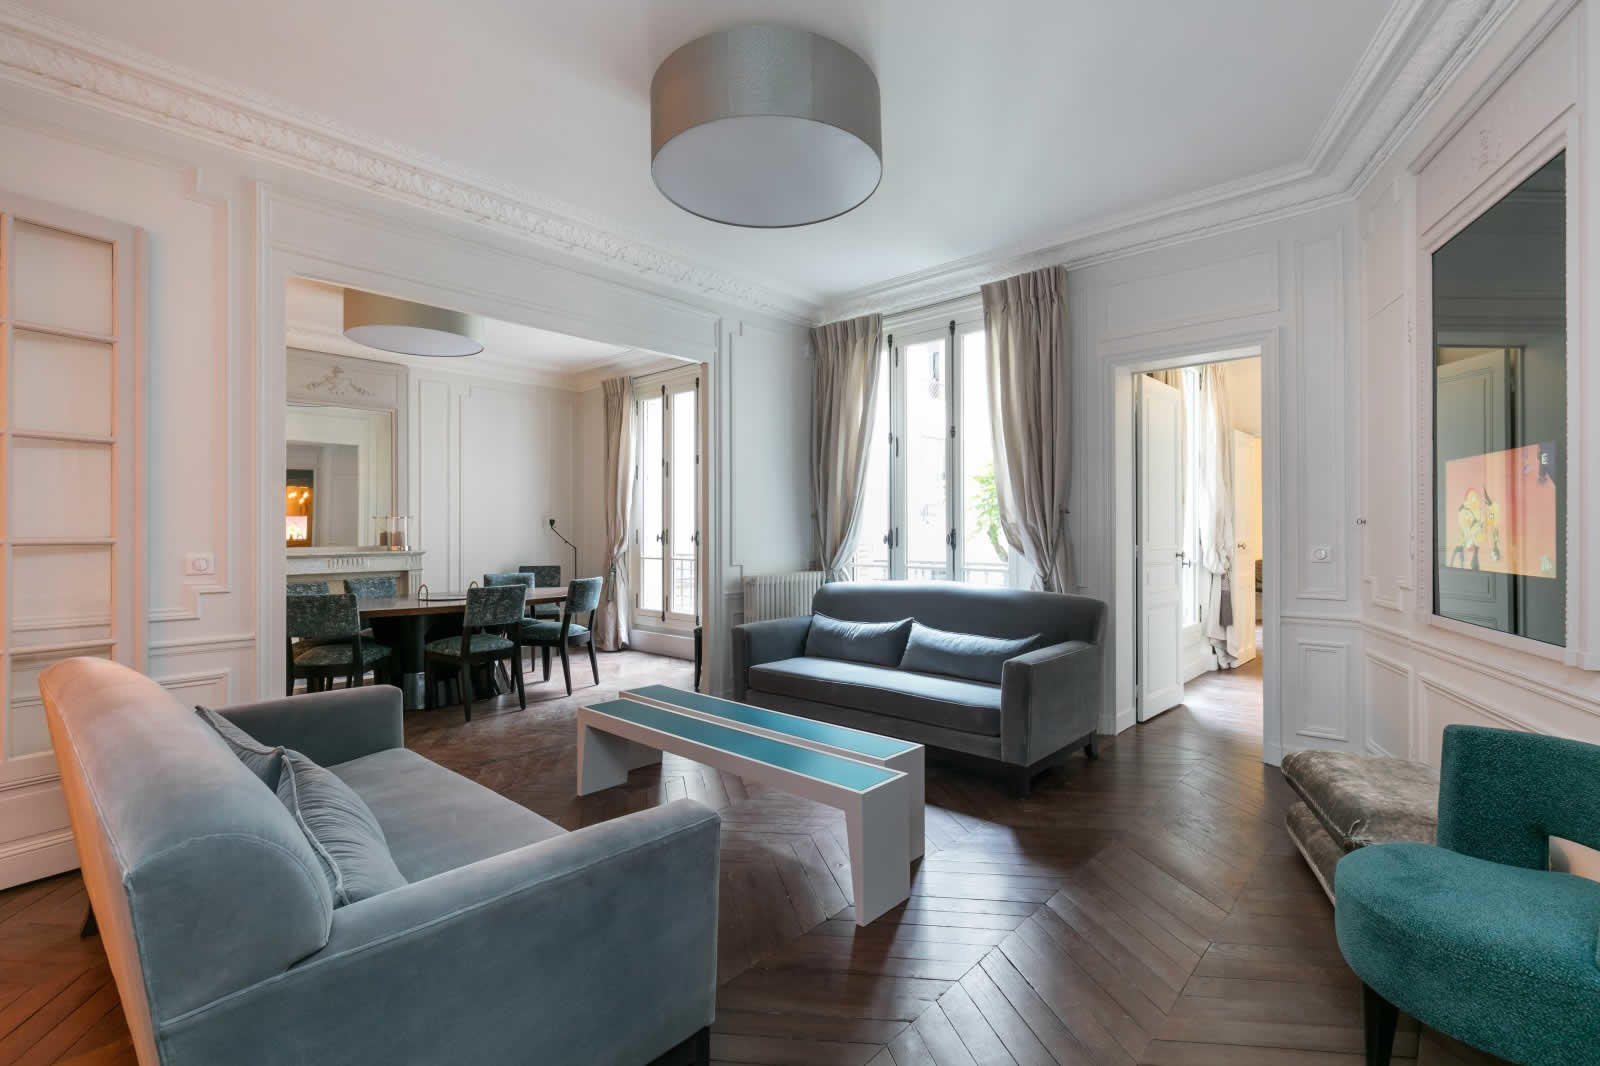 appartement-entierement-renove-studio-a-vendre-quartier-ampere-wagram-buanderie-cave